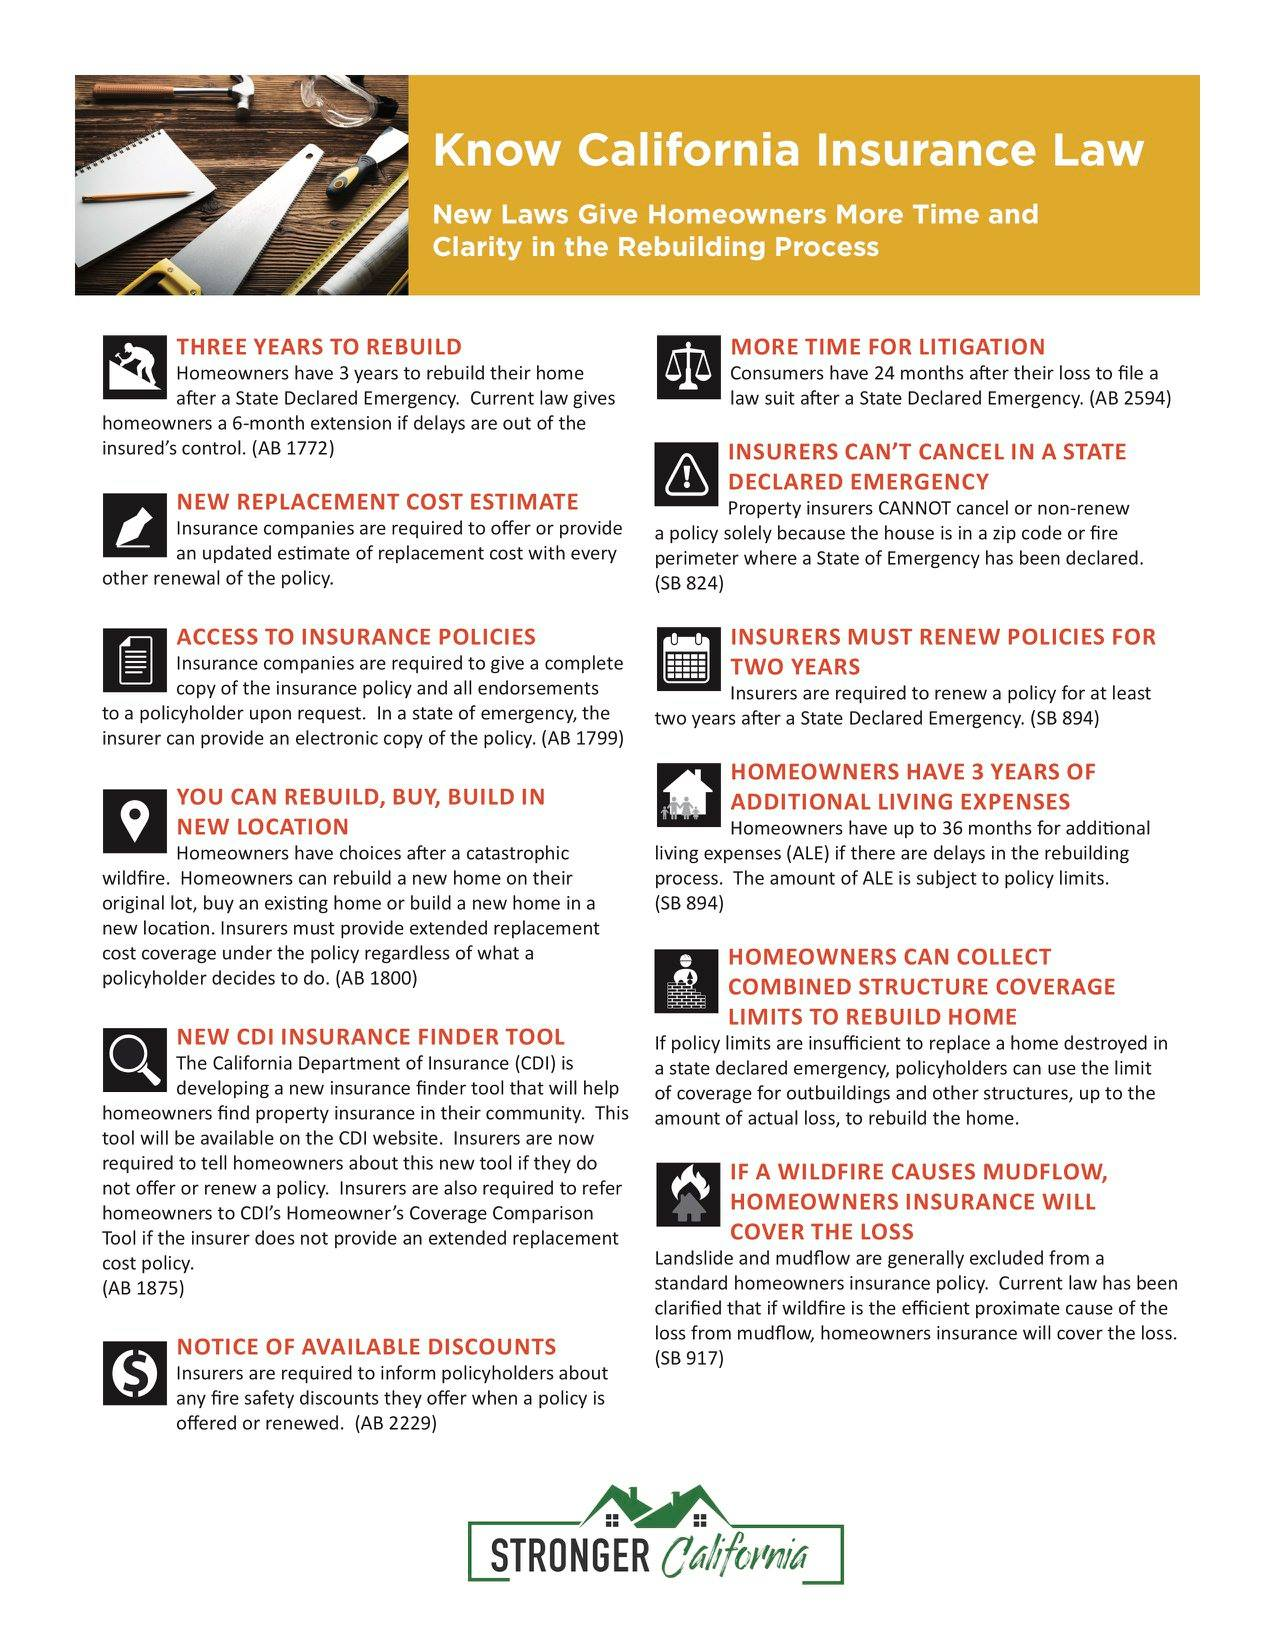 CA Insurance Law